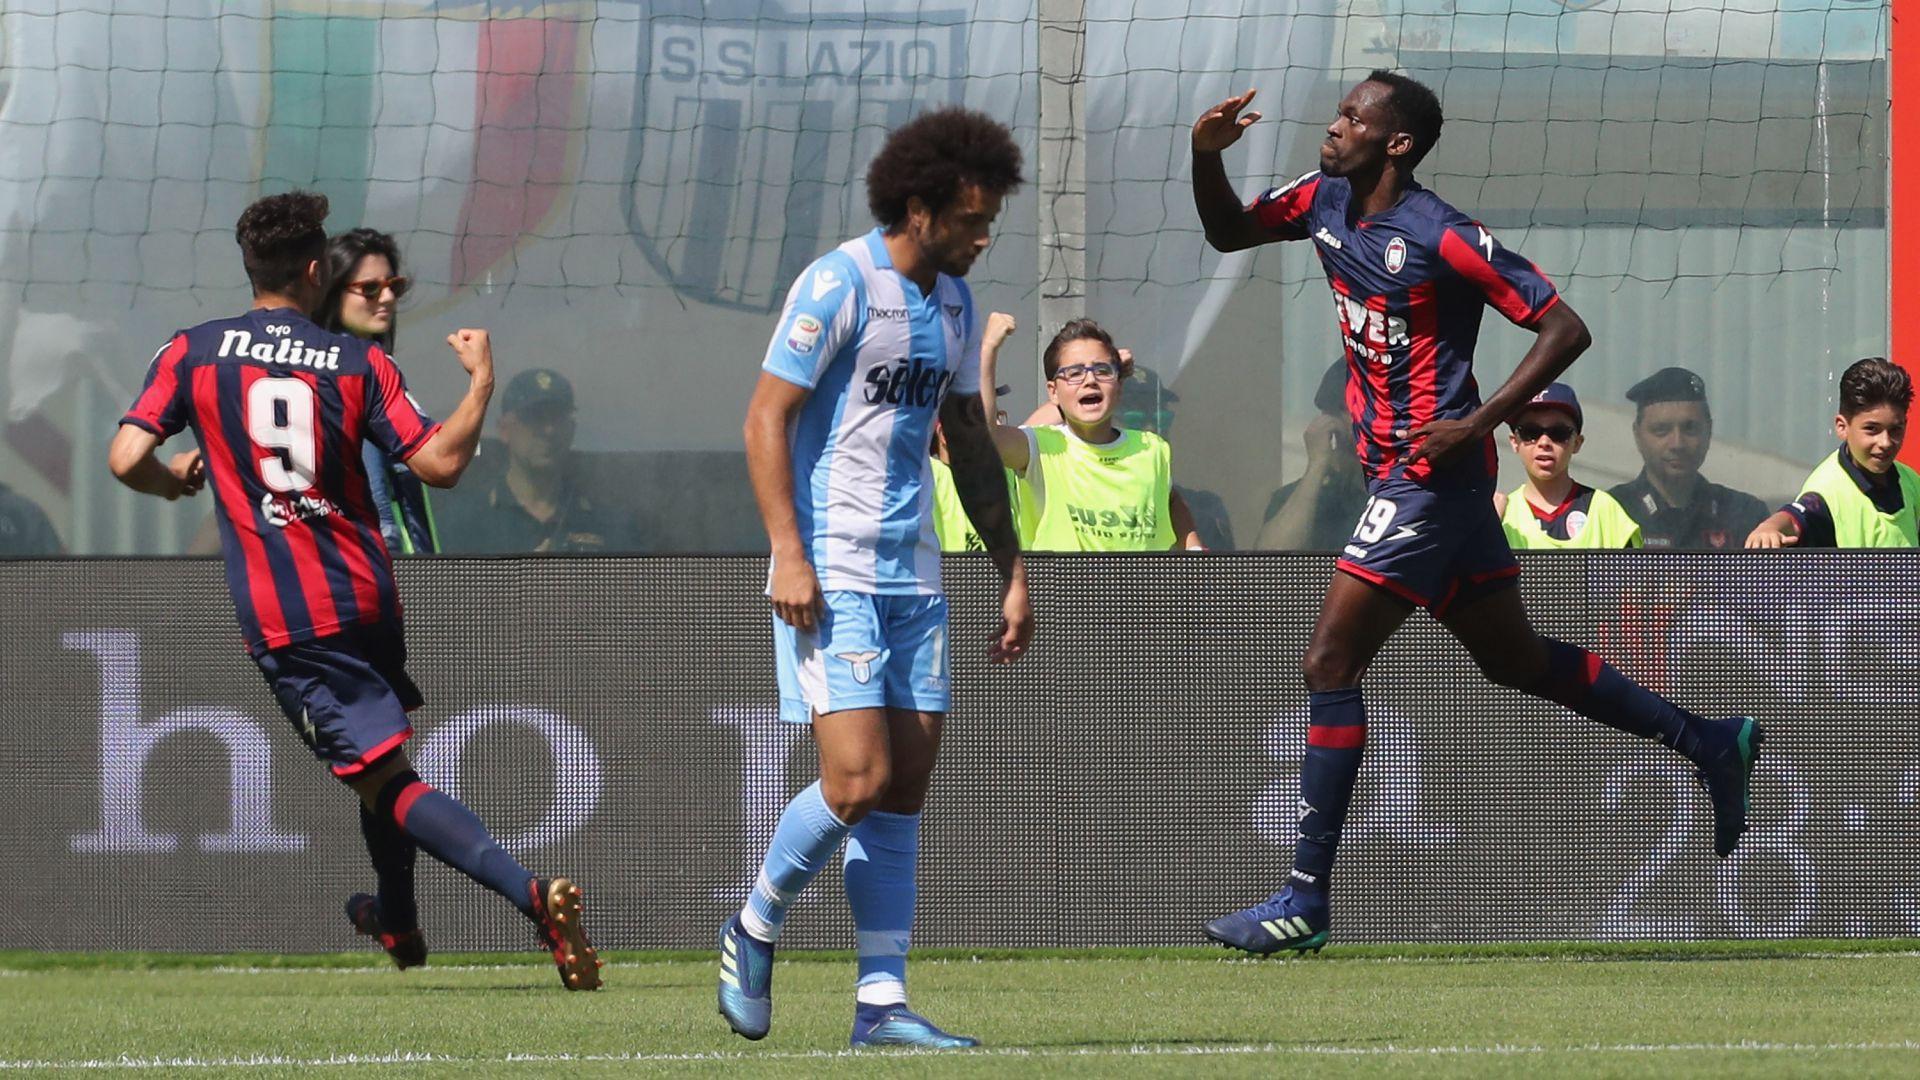 Simeon Nwankwo scores as Lazio deny Crotone crucial win | Goal.com